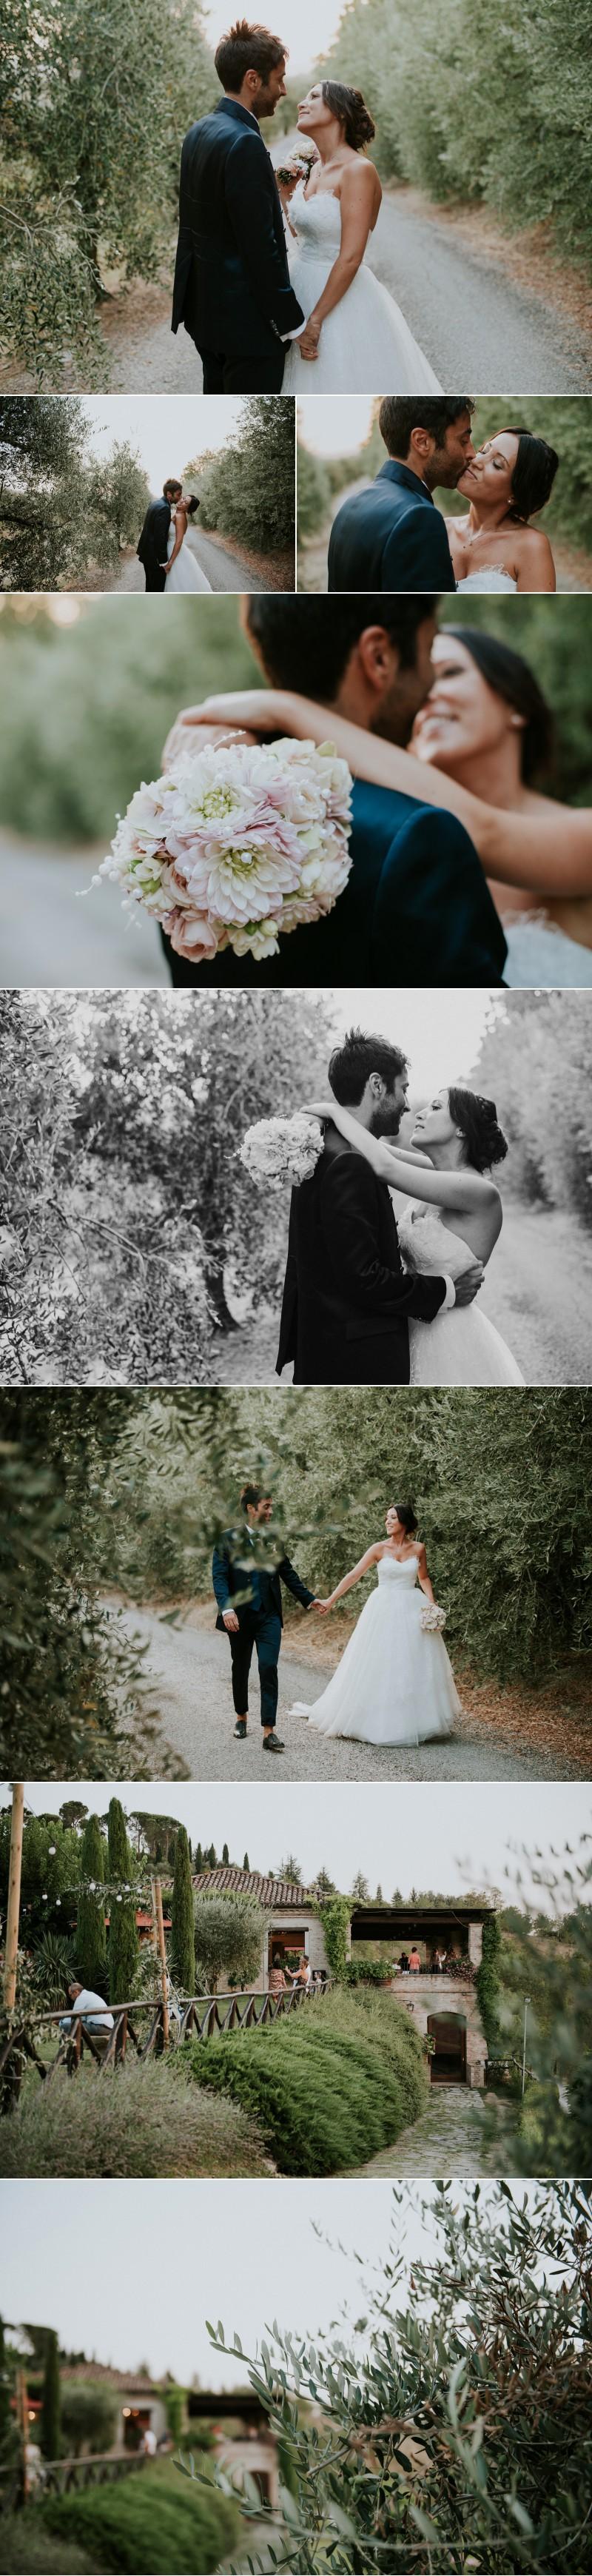 Fotografo Matrimonio Casa Celincordia Cesena 1000